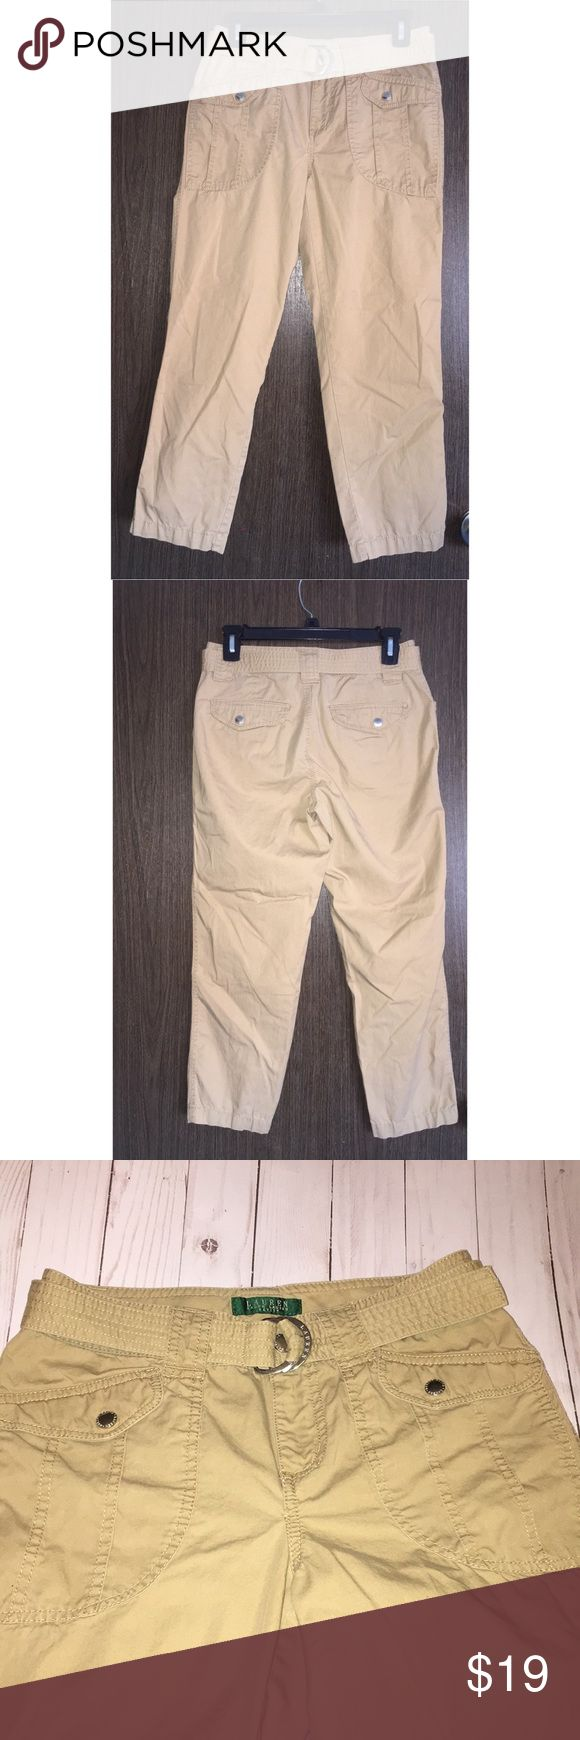 "Ralph Lauren 2P cargo khaki capris belted 2P approx 14"" waist laying flat. Approx 24"" inseam and 9"" rise. Lauren Ralph Lauren Pants Capris"